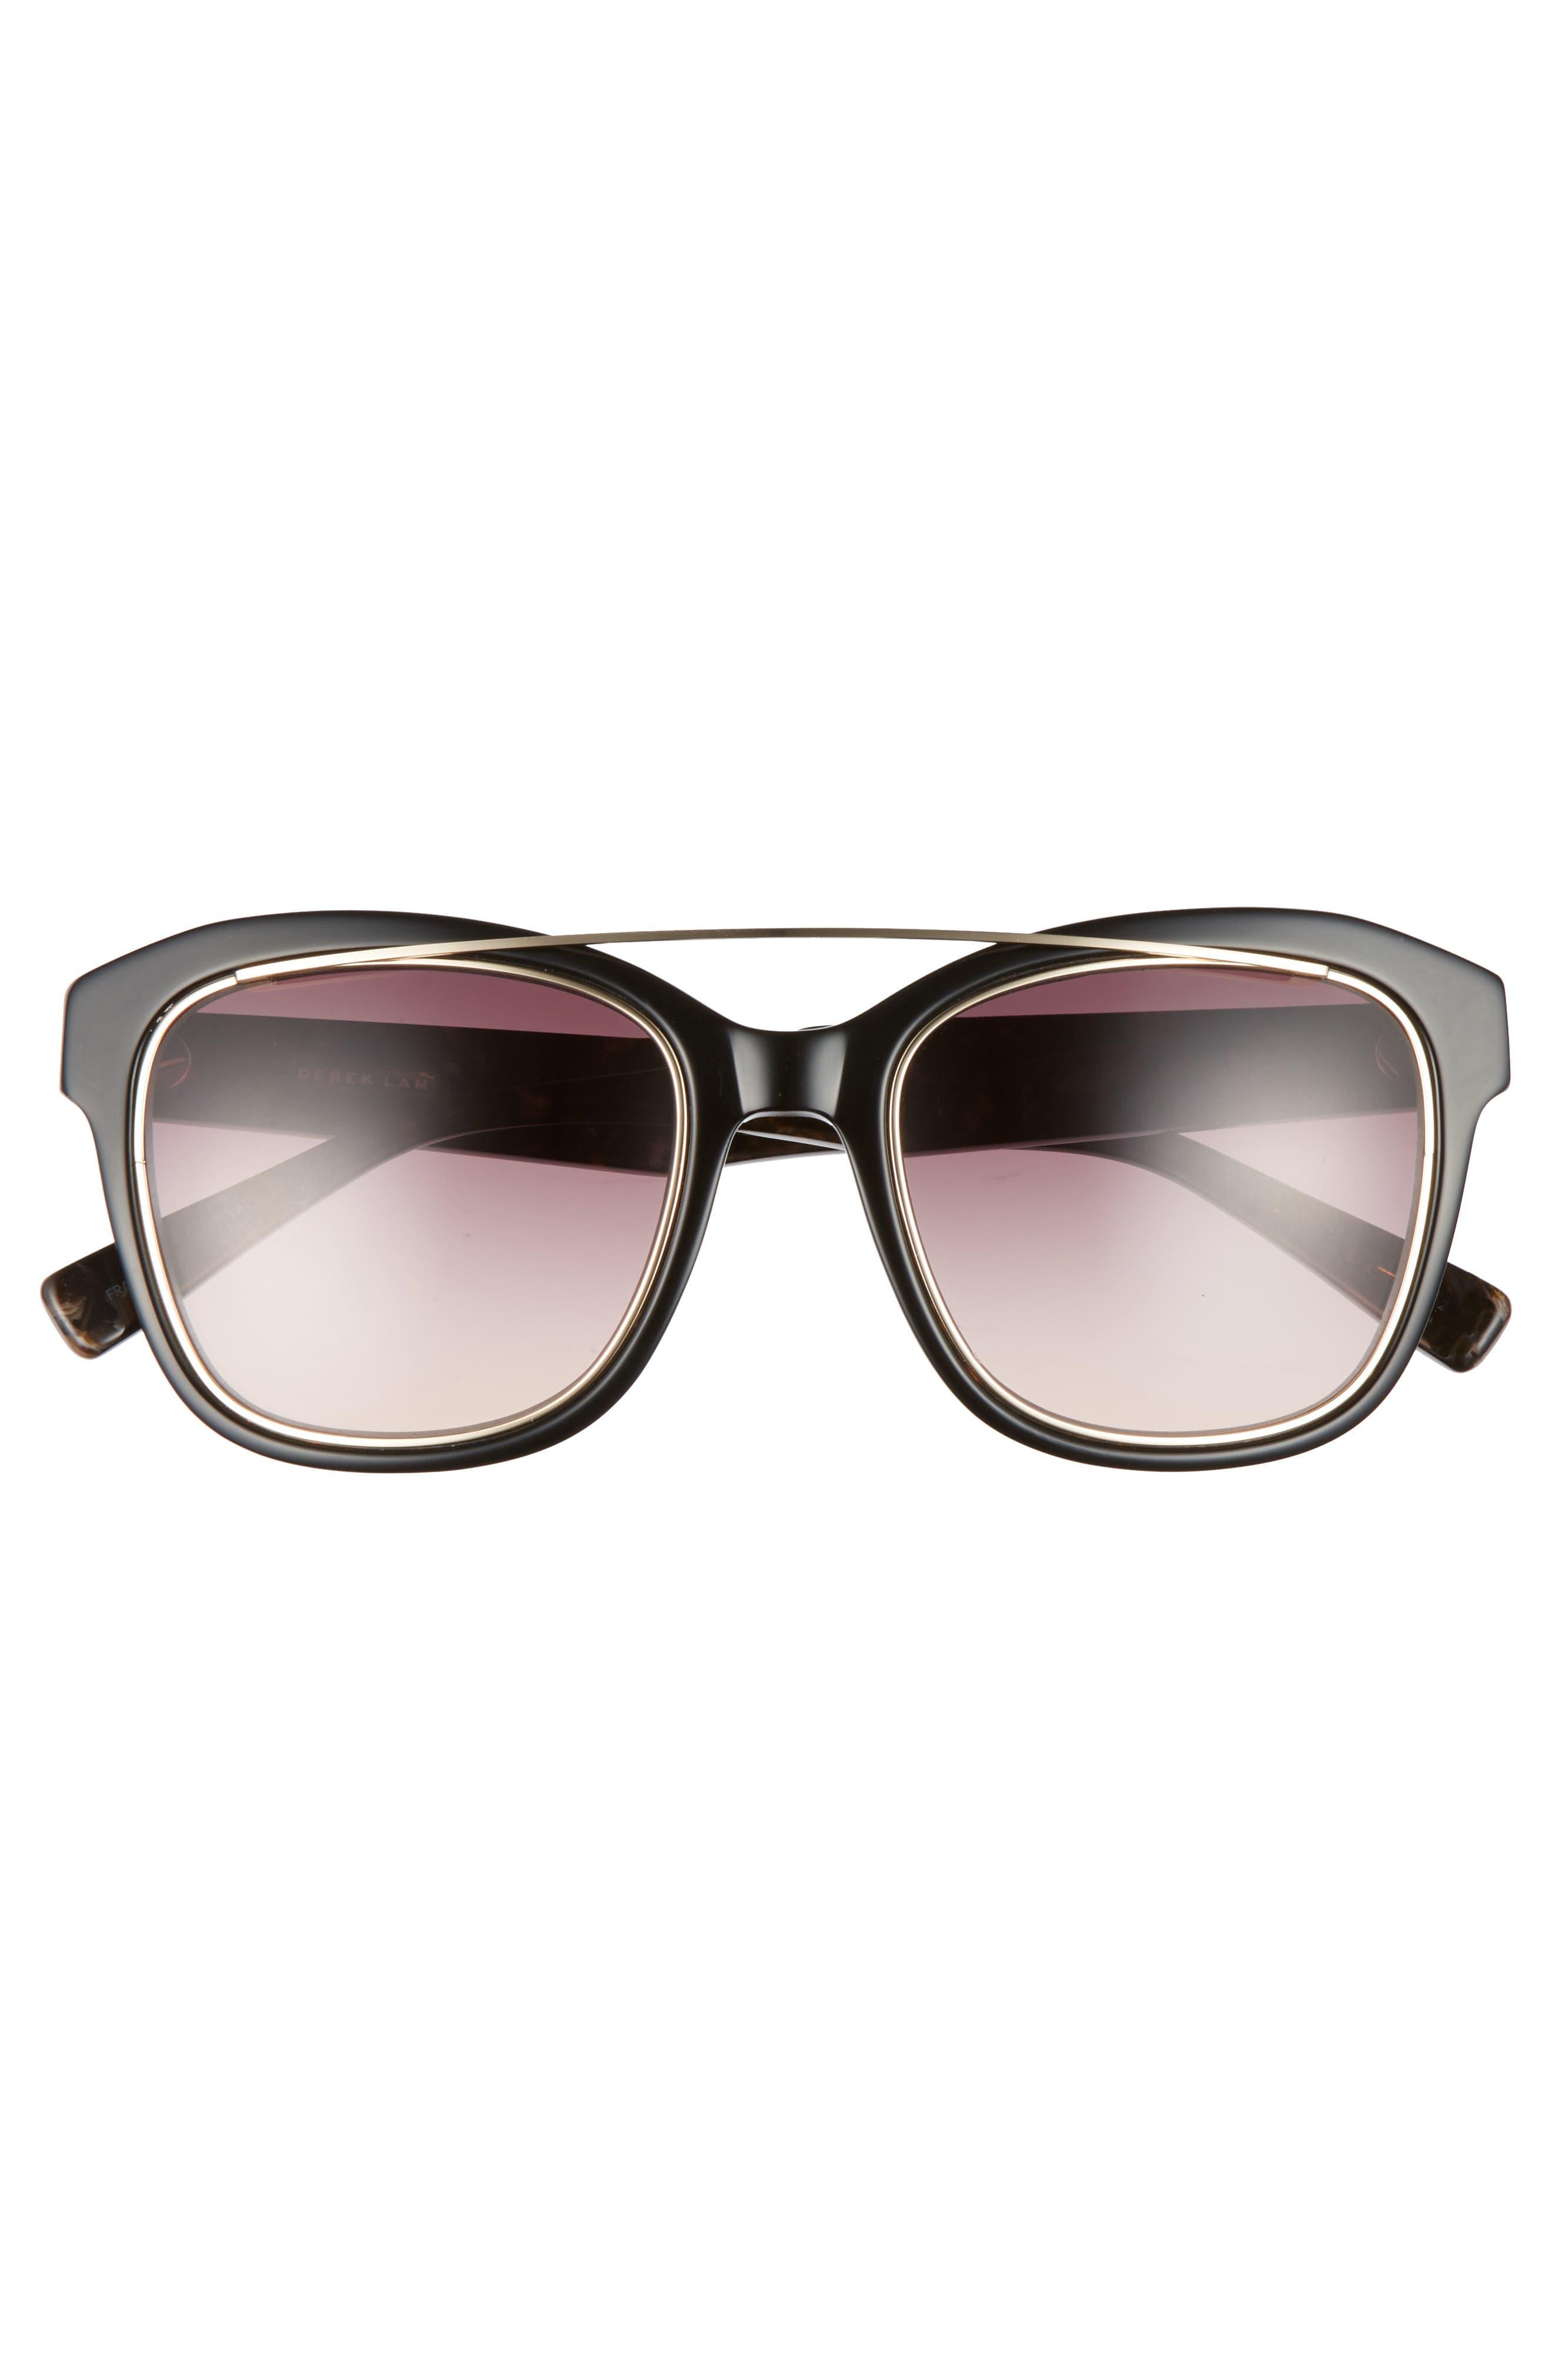 DEREK LAM,                             Hudson 52mm Gradient Sunglasses,                             Alternate thumbnail 3, color,                             001